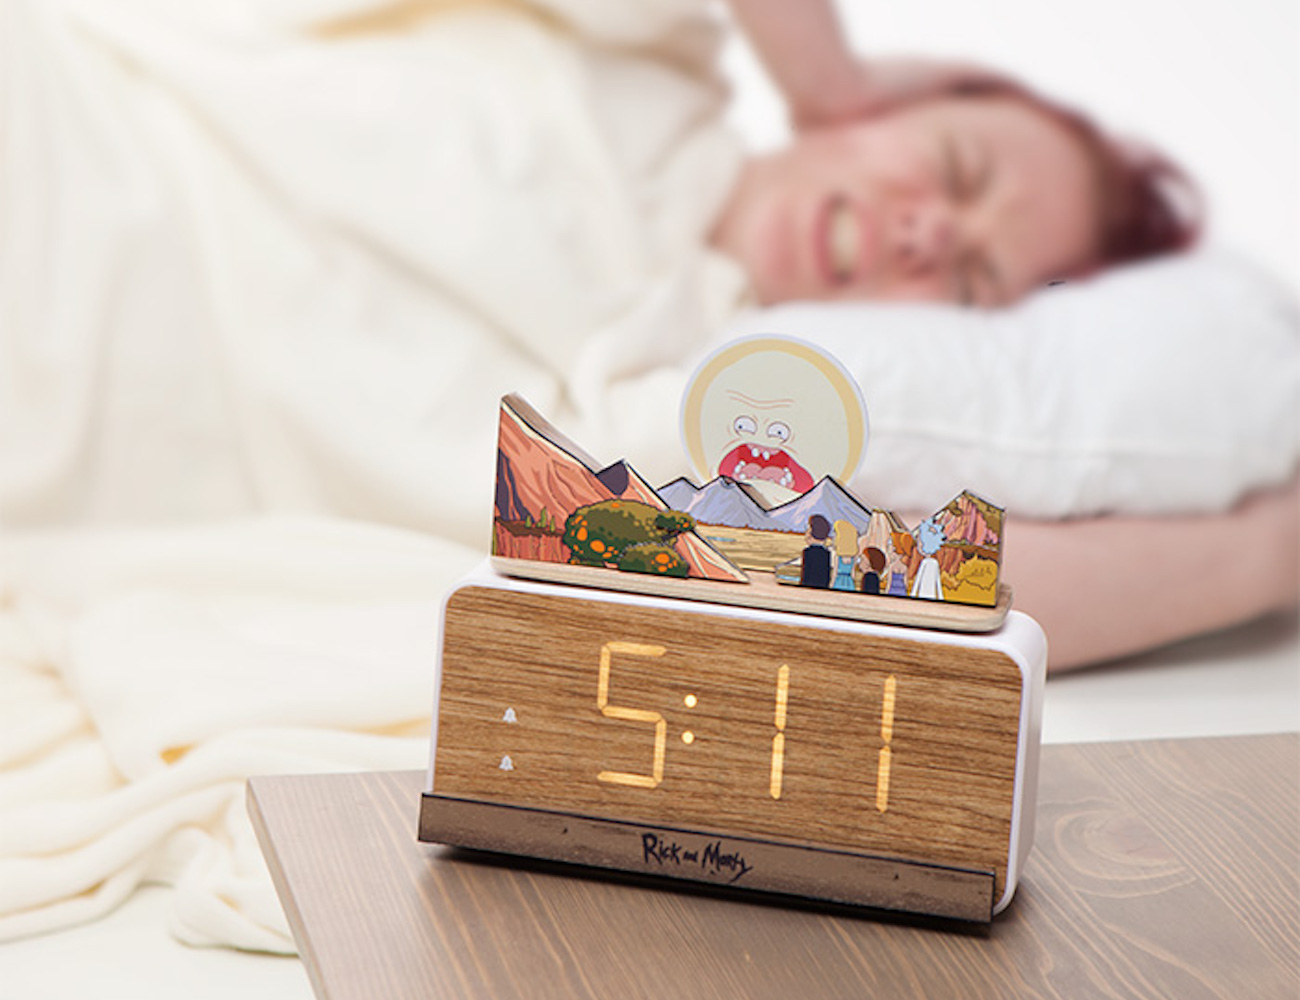 ThinkGeek Rick and Morty Screaming Sun Alarm Clock